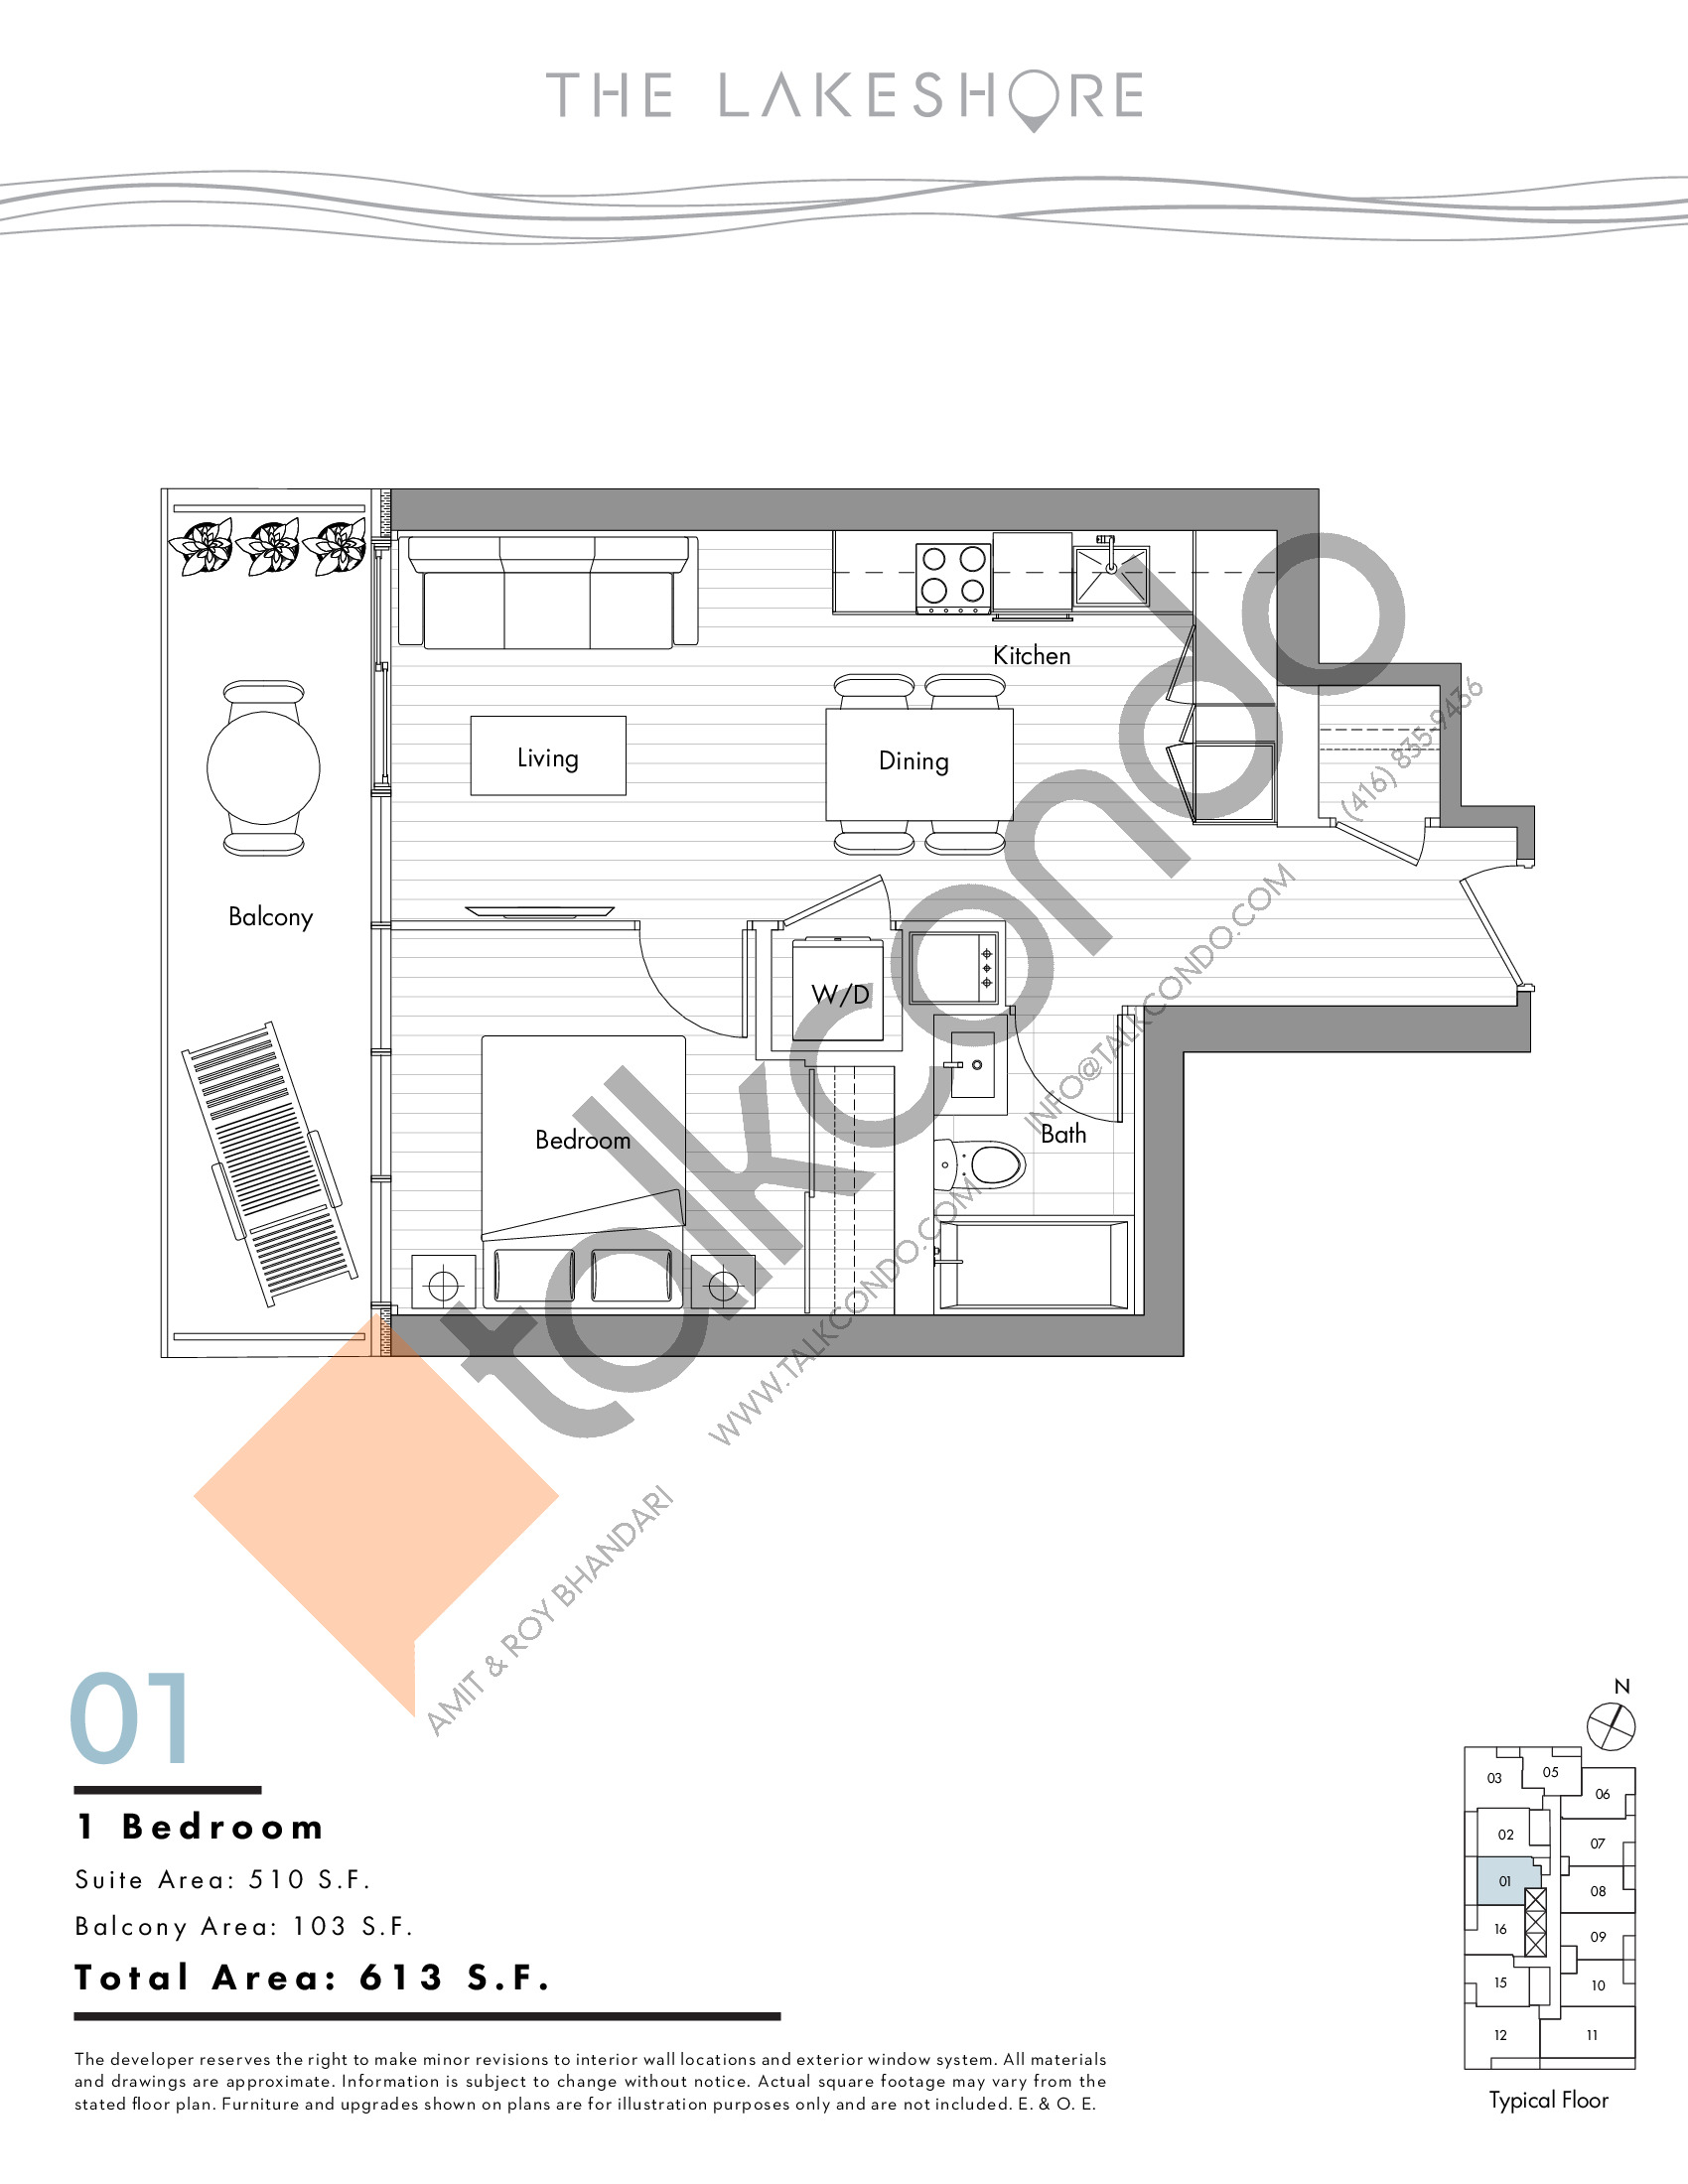 01 Floor Plan at The LakeShore Condos - 510 sq.ft